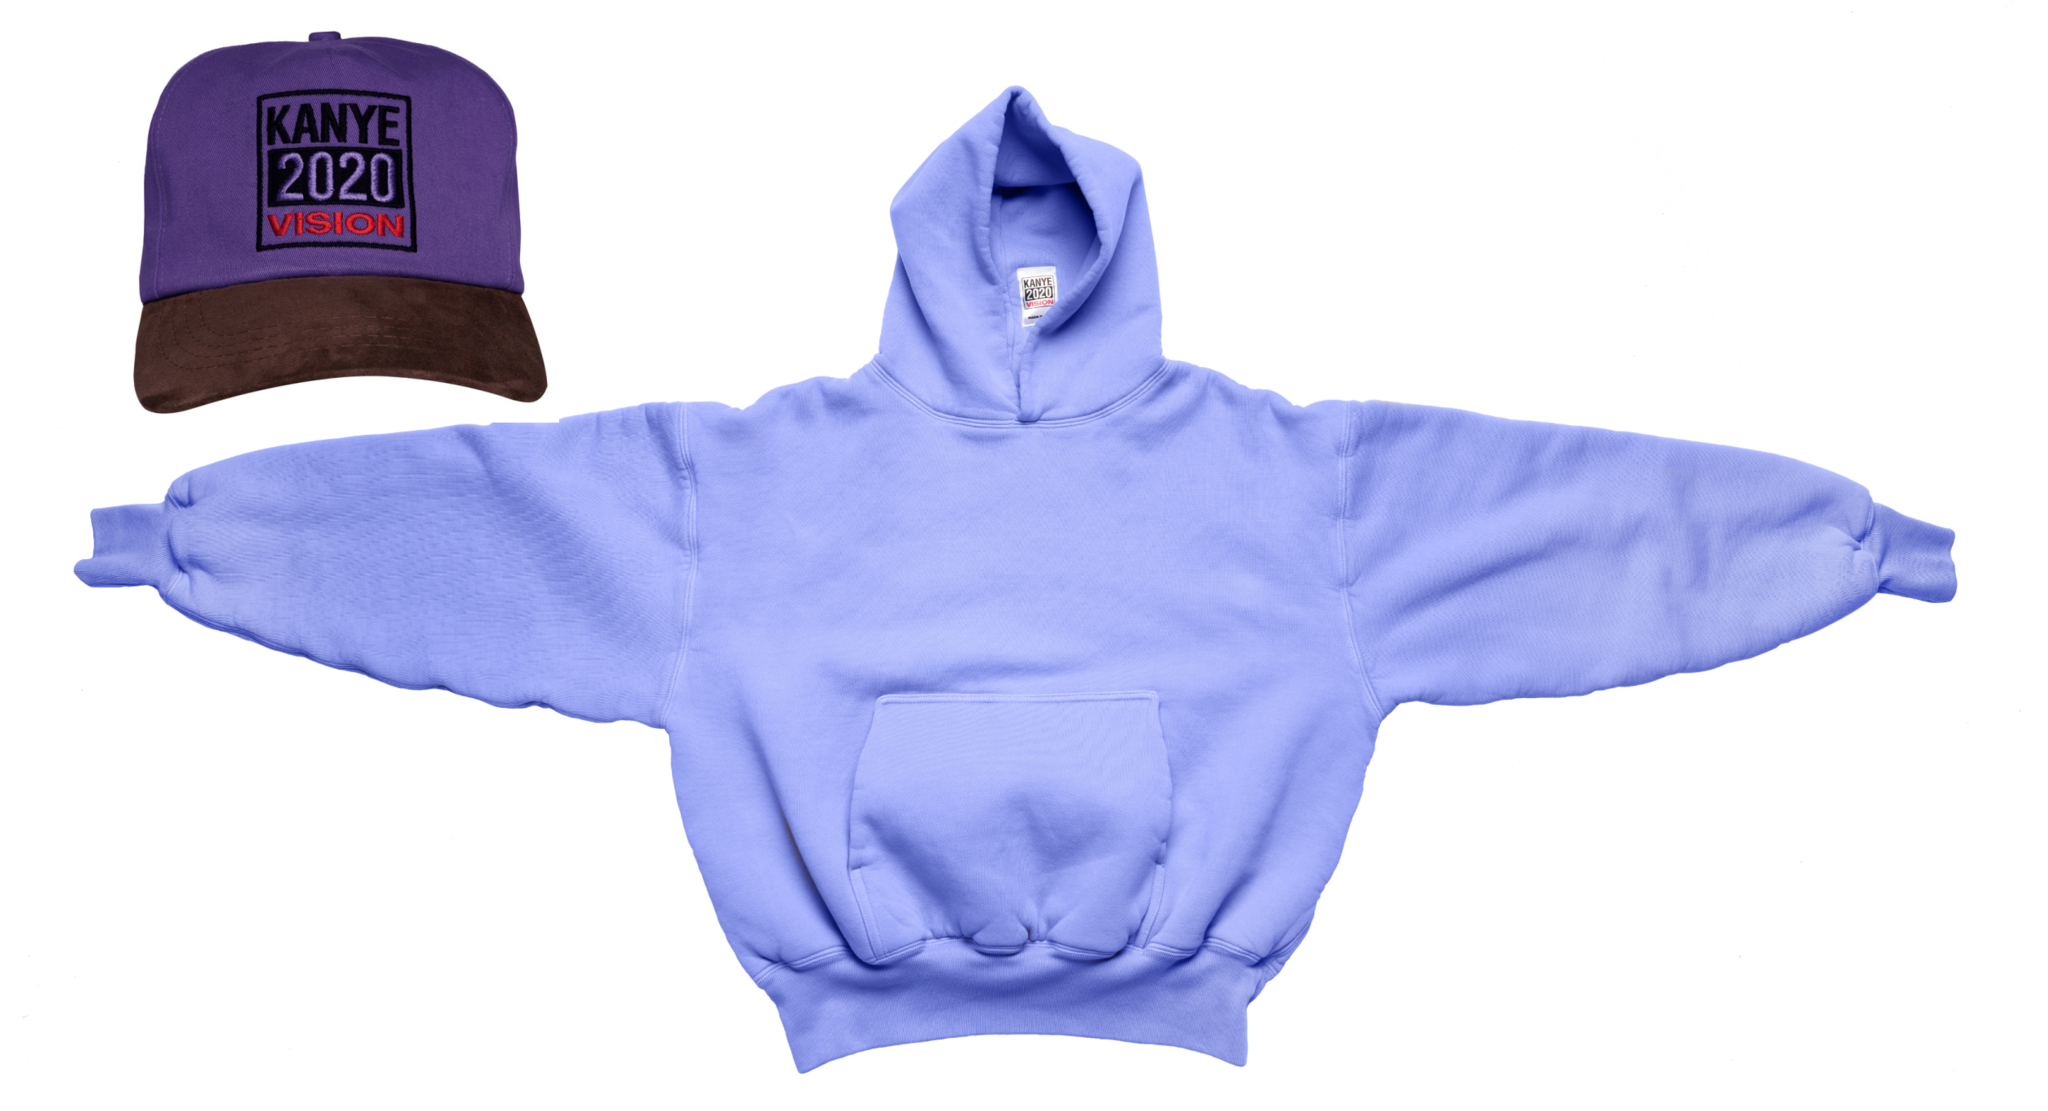 Kanye 2020 hat and hoodie